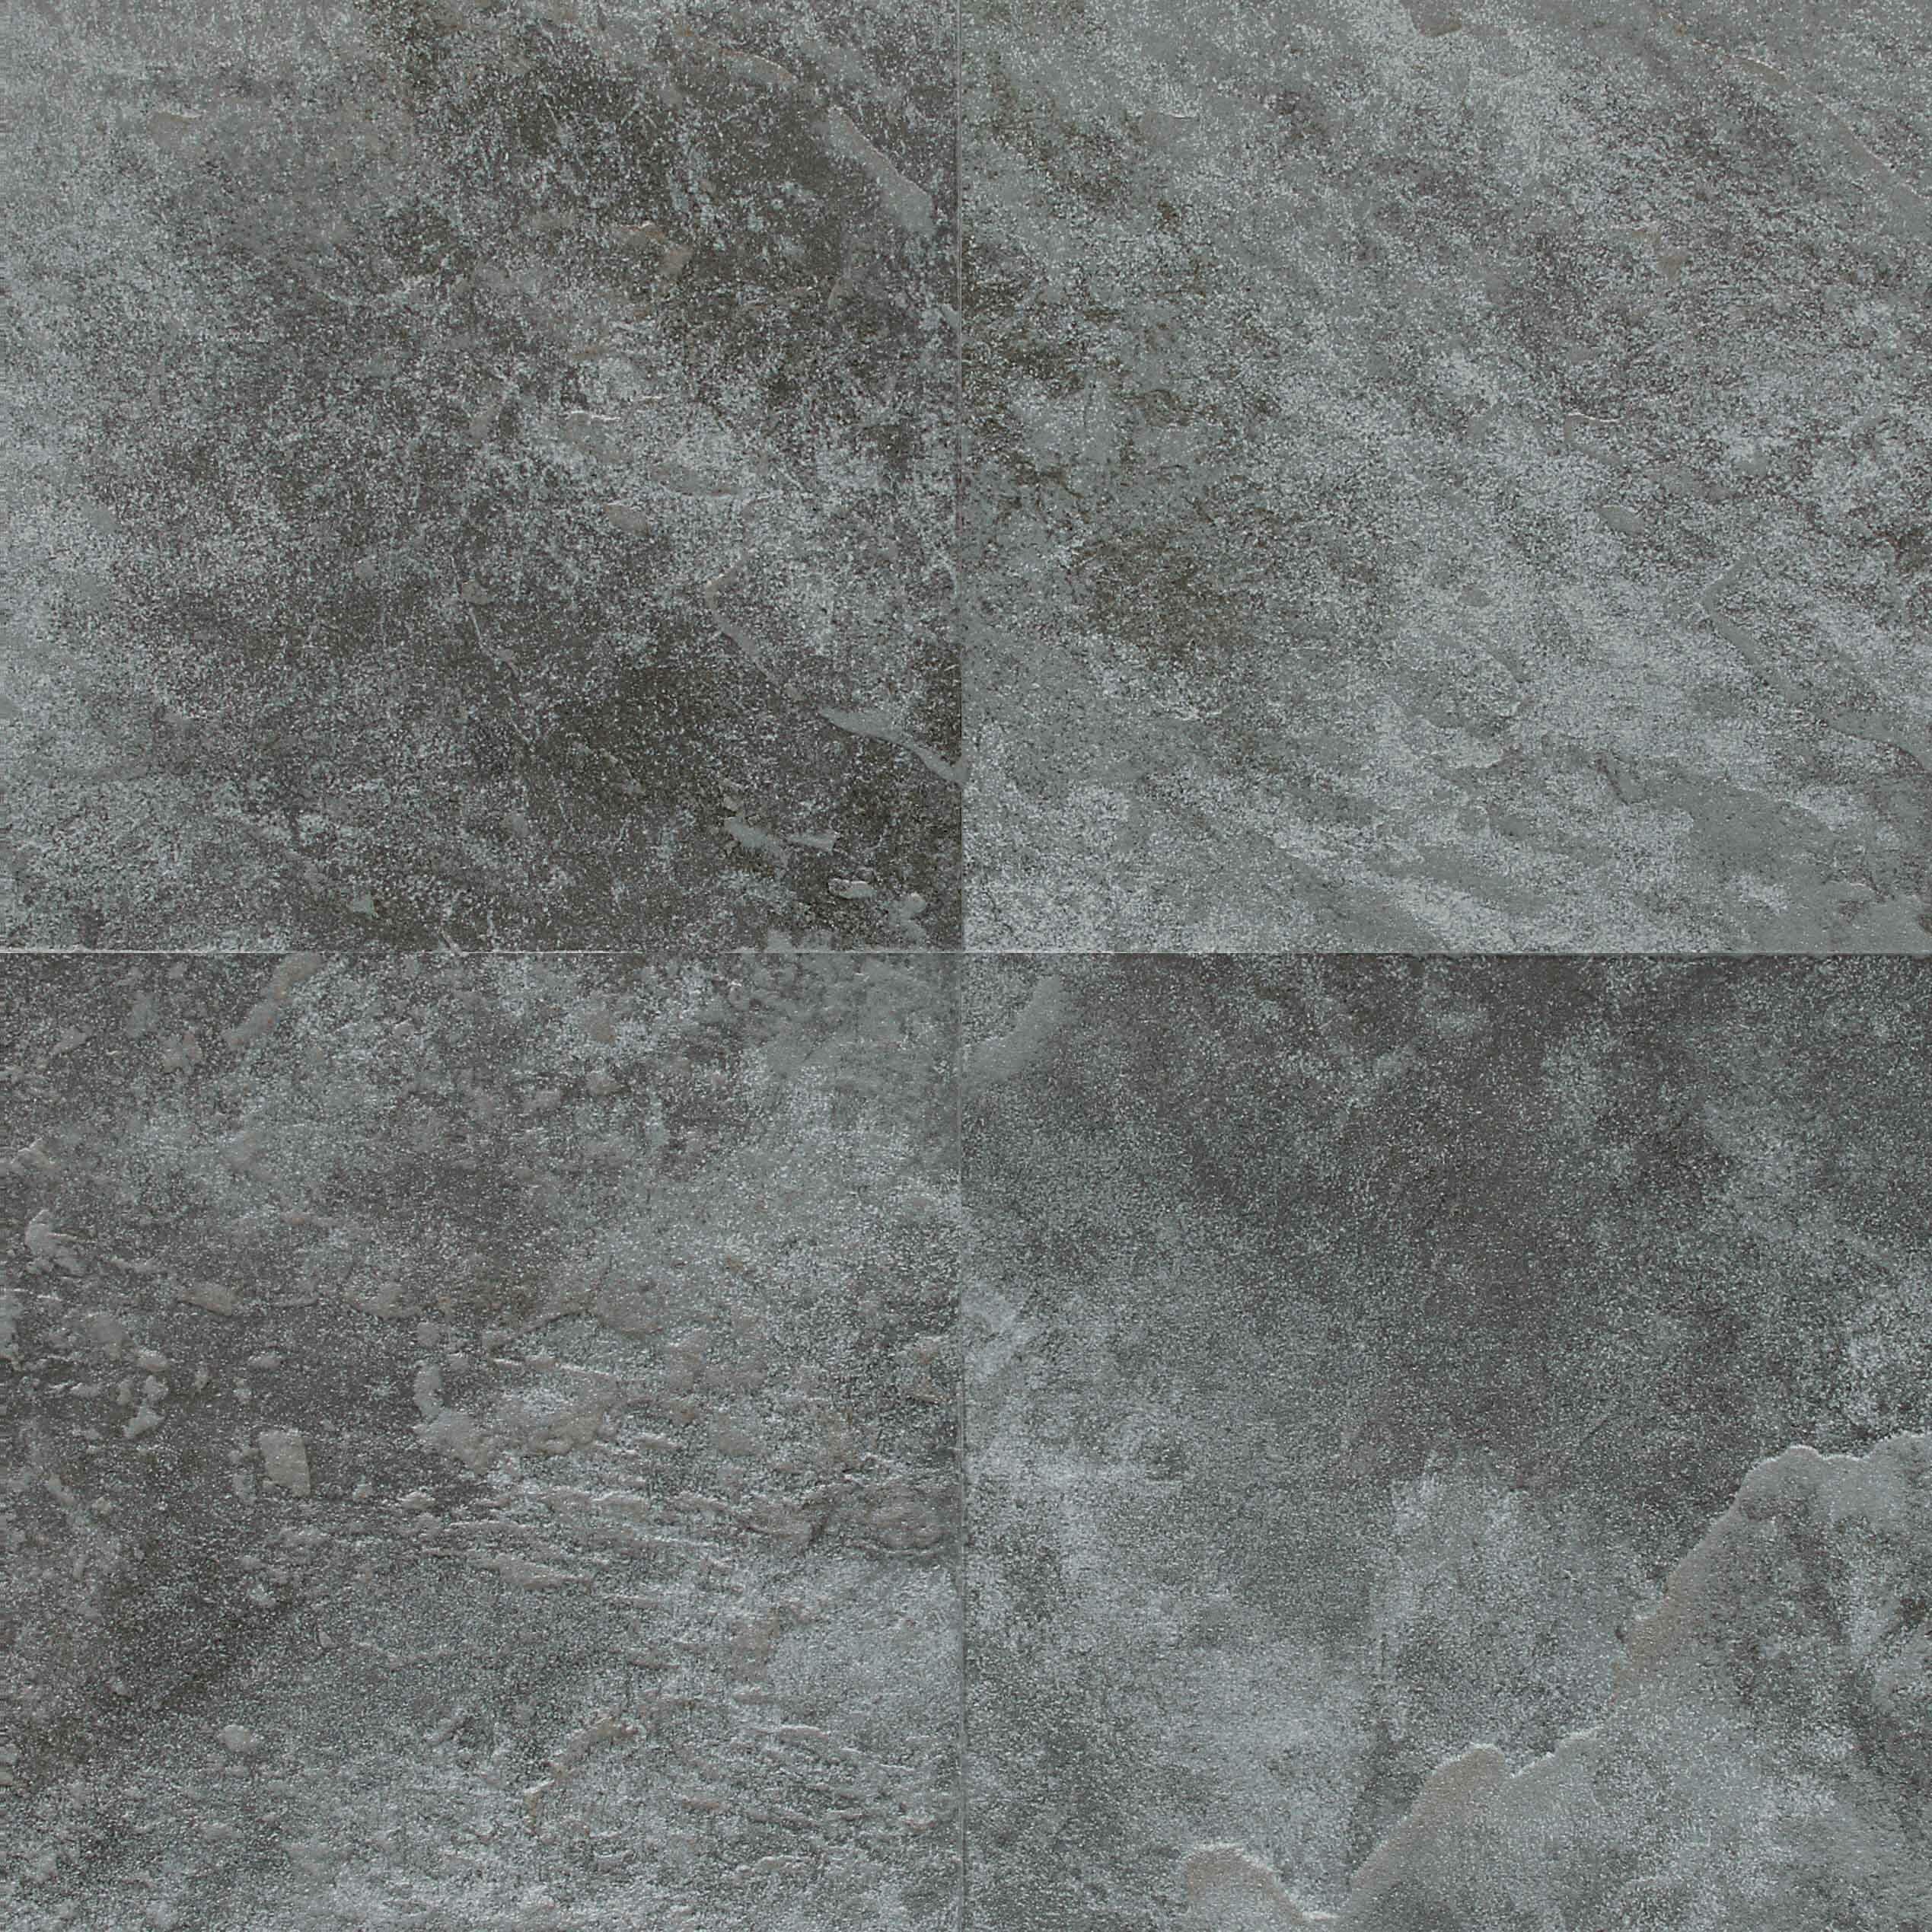 daltile continental slate 12 39 39 x 12 39 39 porcelain field tile